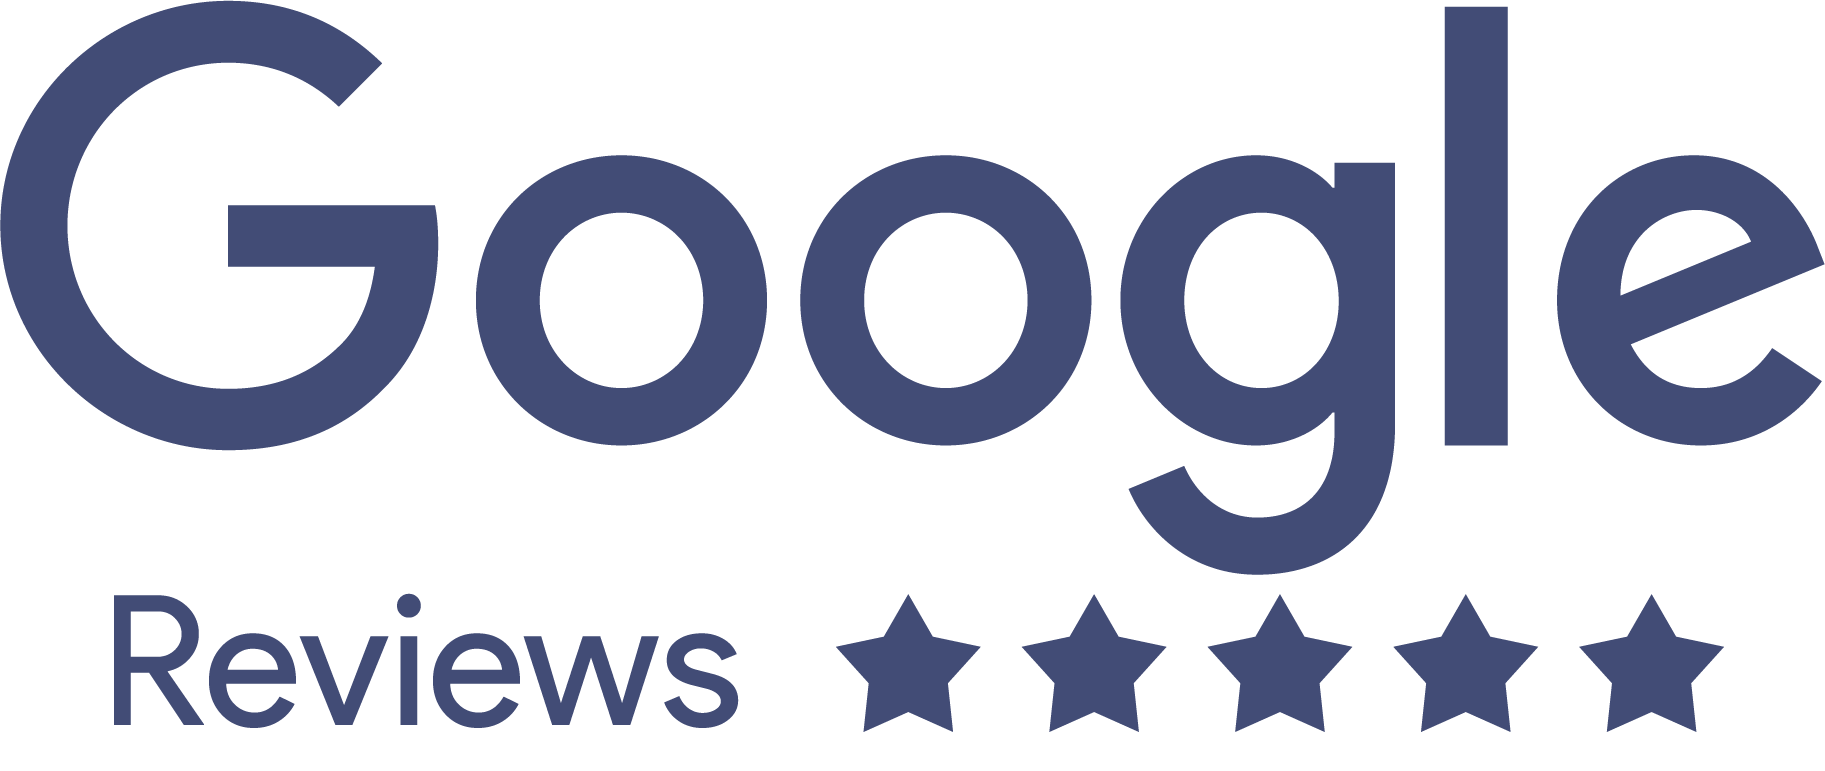 Google Review Blue-1